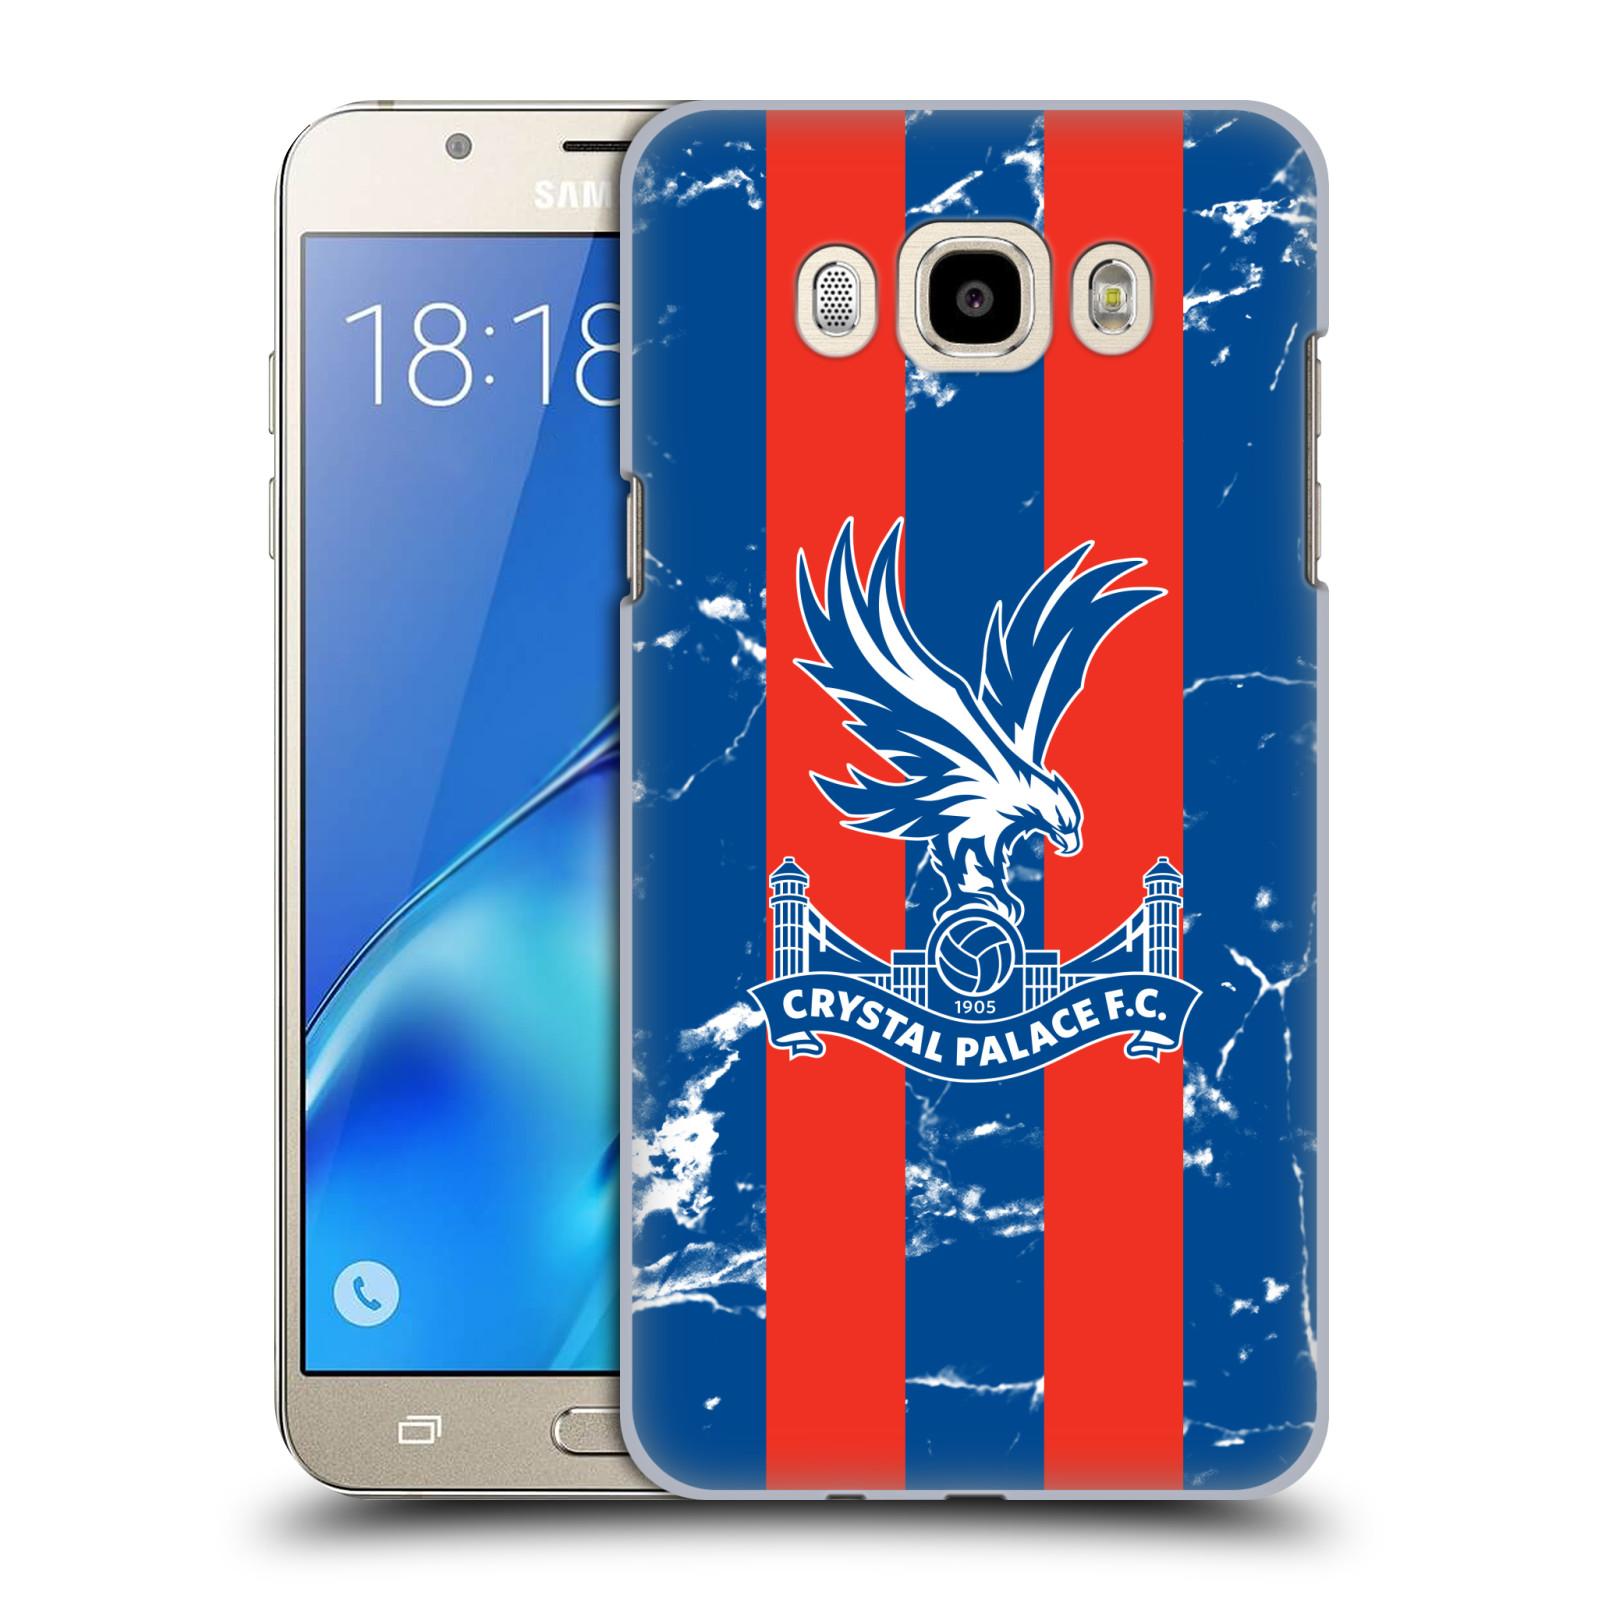 Oficial-Crystal-Palace-FC-2017-18-Marmol-Funda-Rigida-posterior-para-Telefonos-SAMSUNG-3